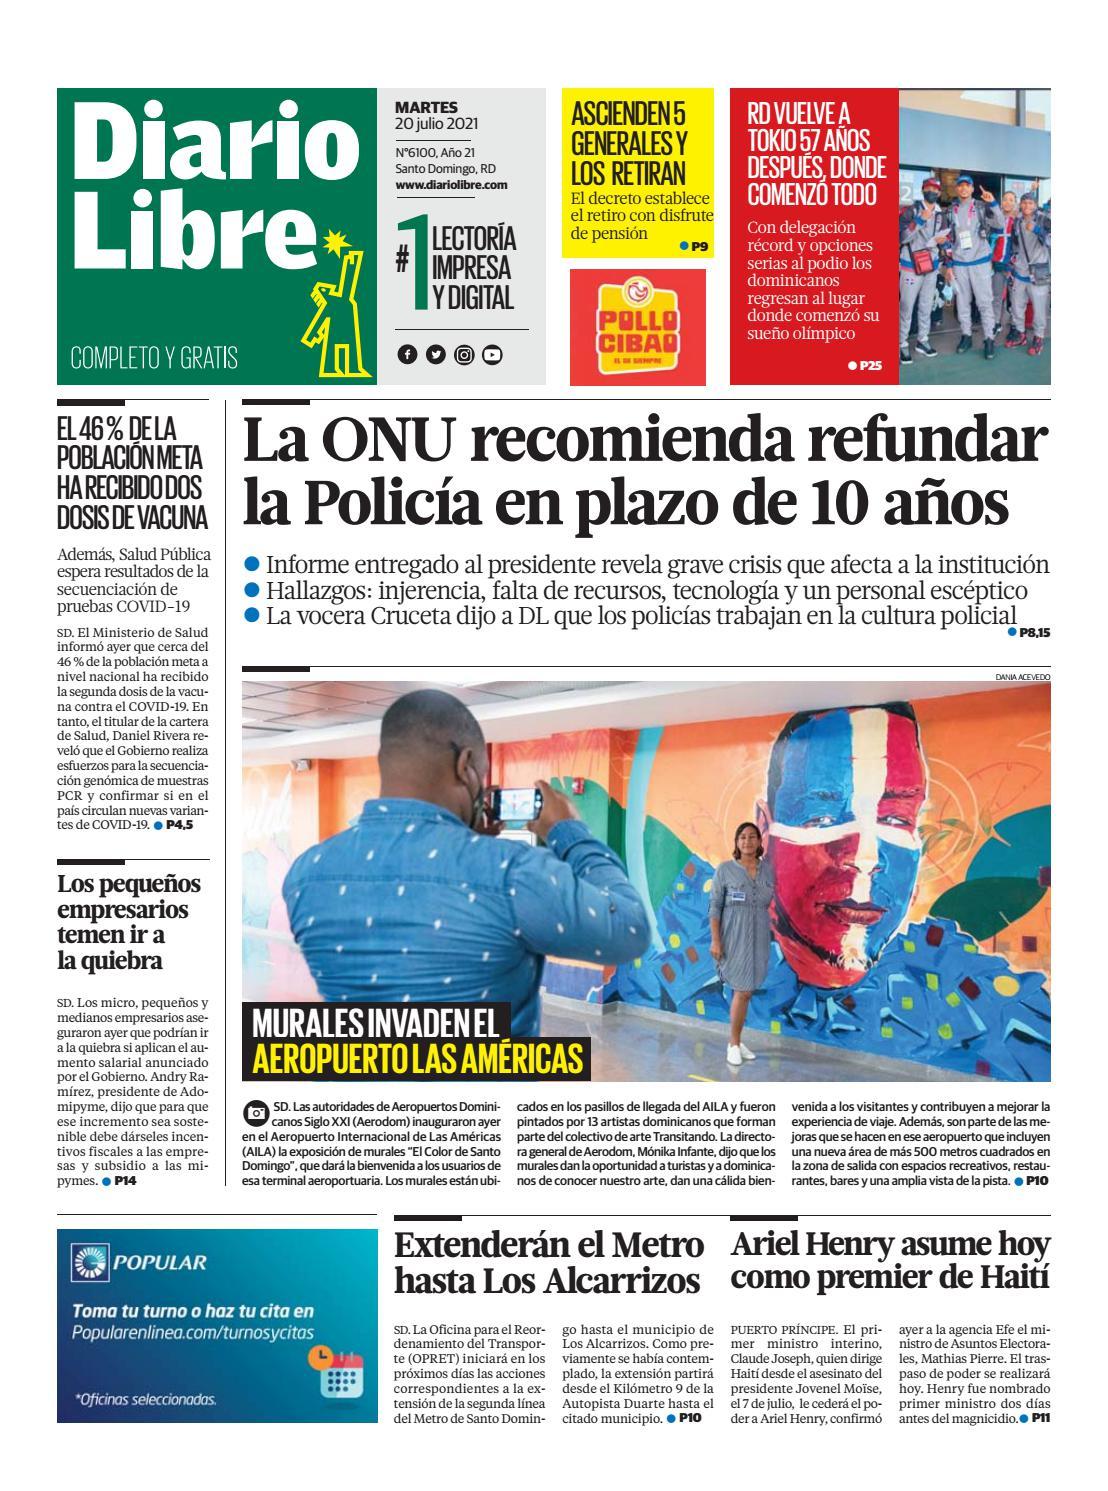 Portada Periódico Diario Libre, Martes 20 Julio, 2021